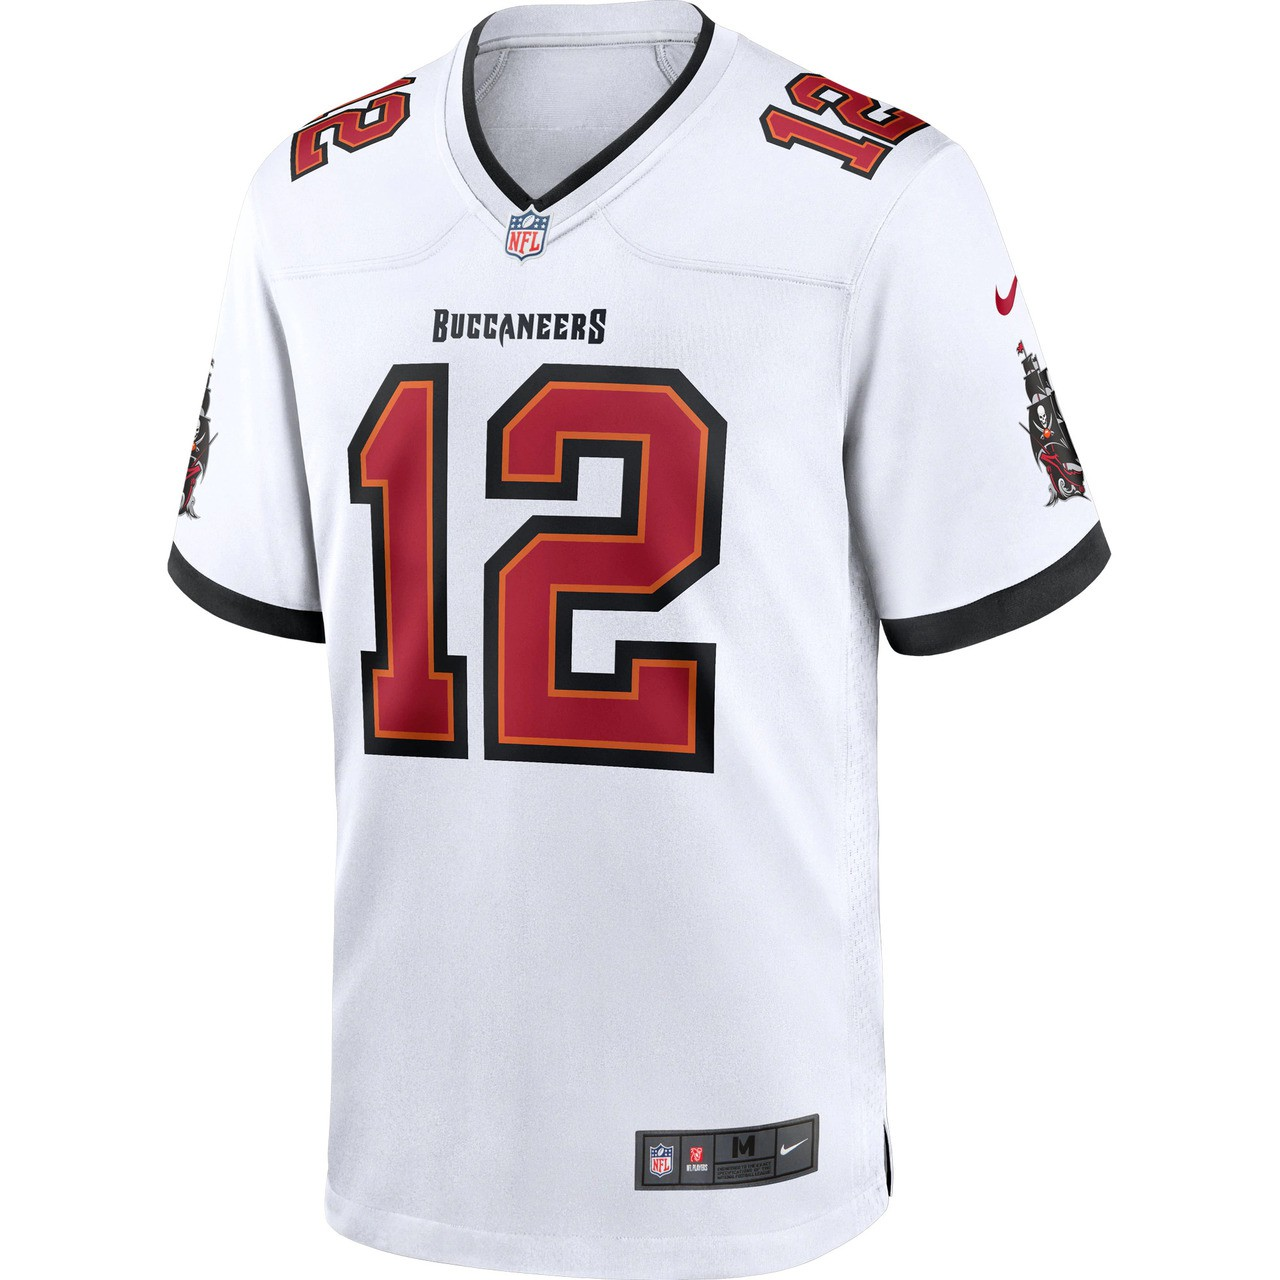 Camisa Futebol Americano Nike Tampa Bay Buccaneers 2020 - Branco